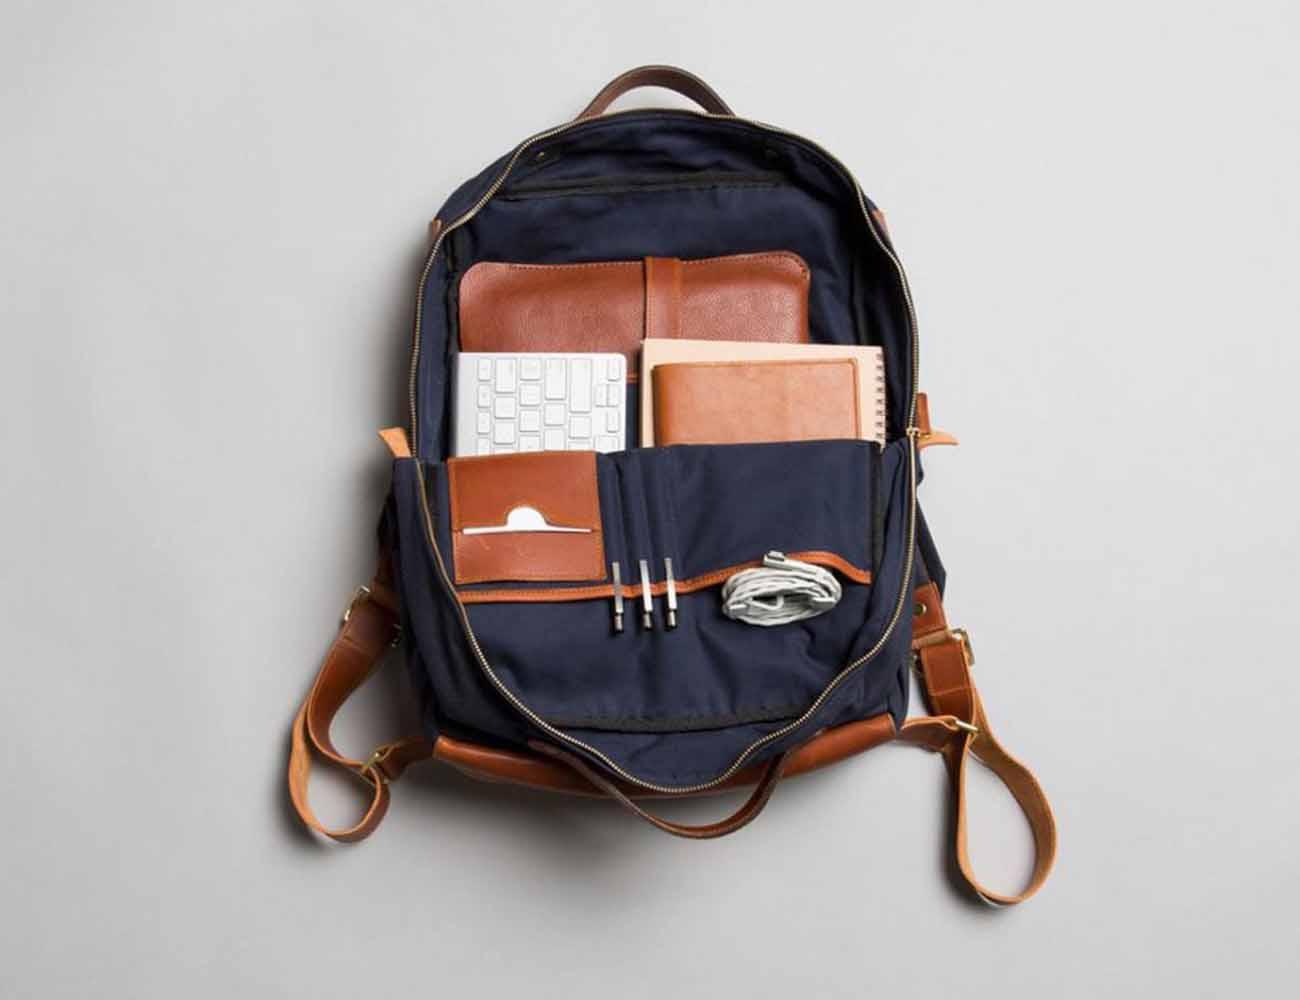 The Modern Day Briefcase by Breton